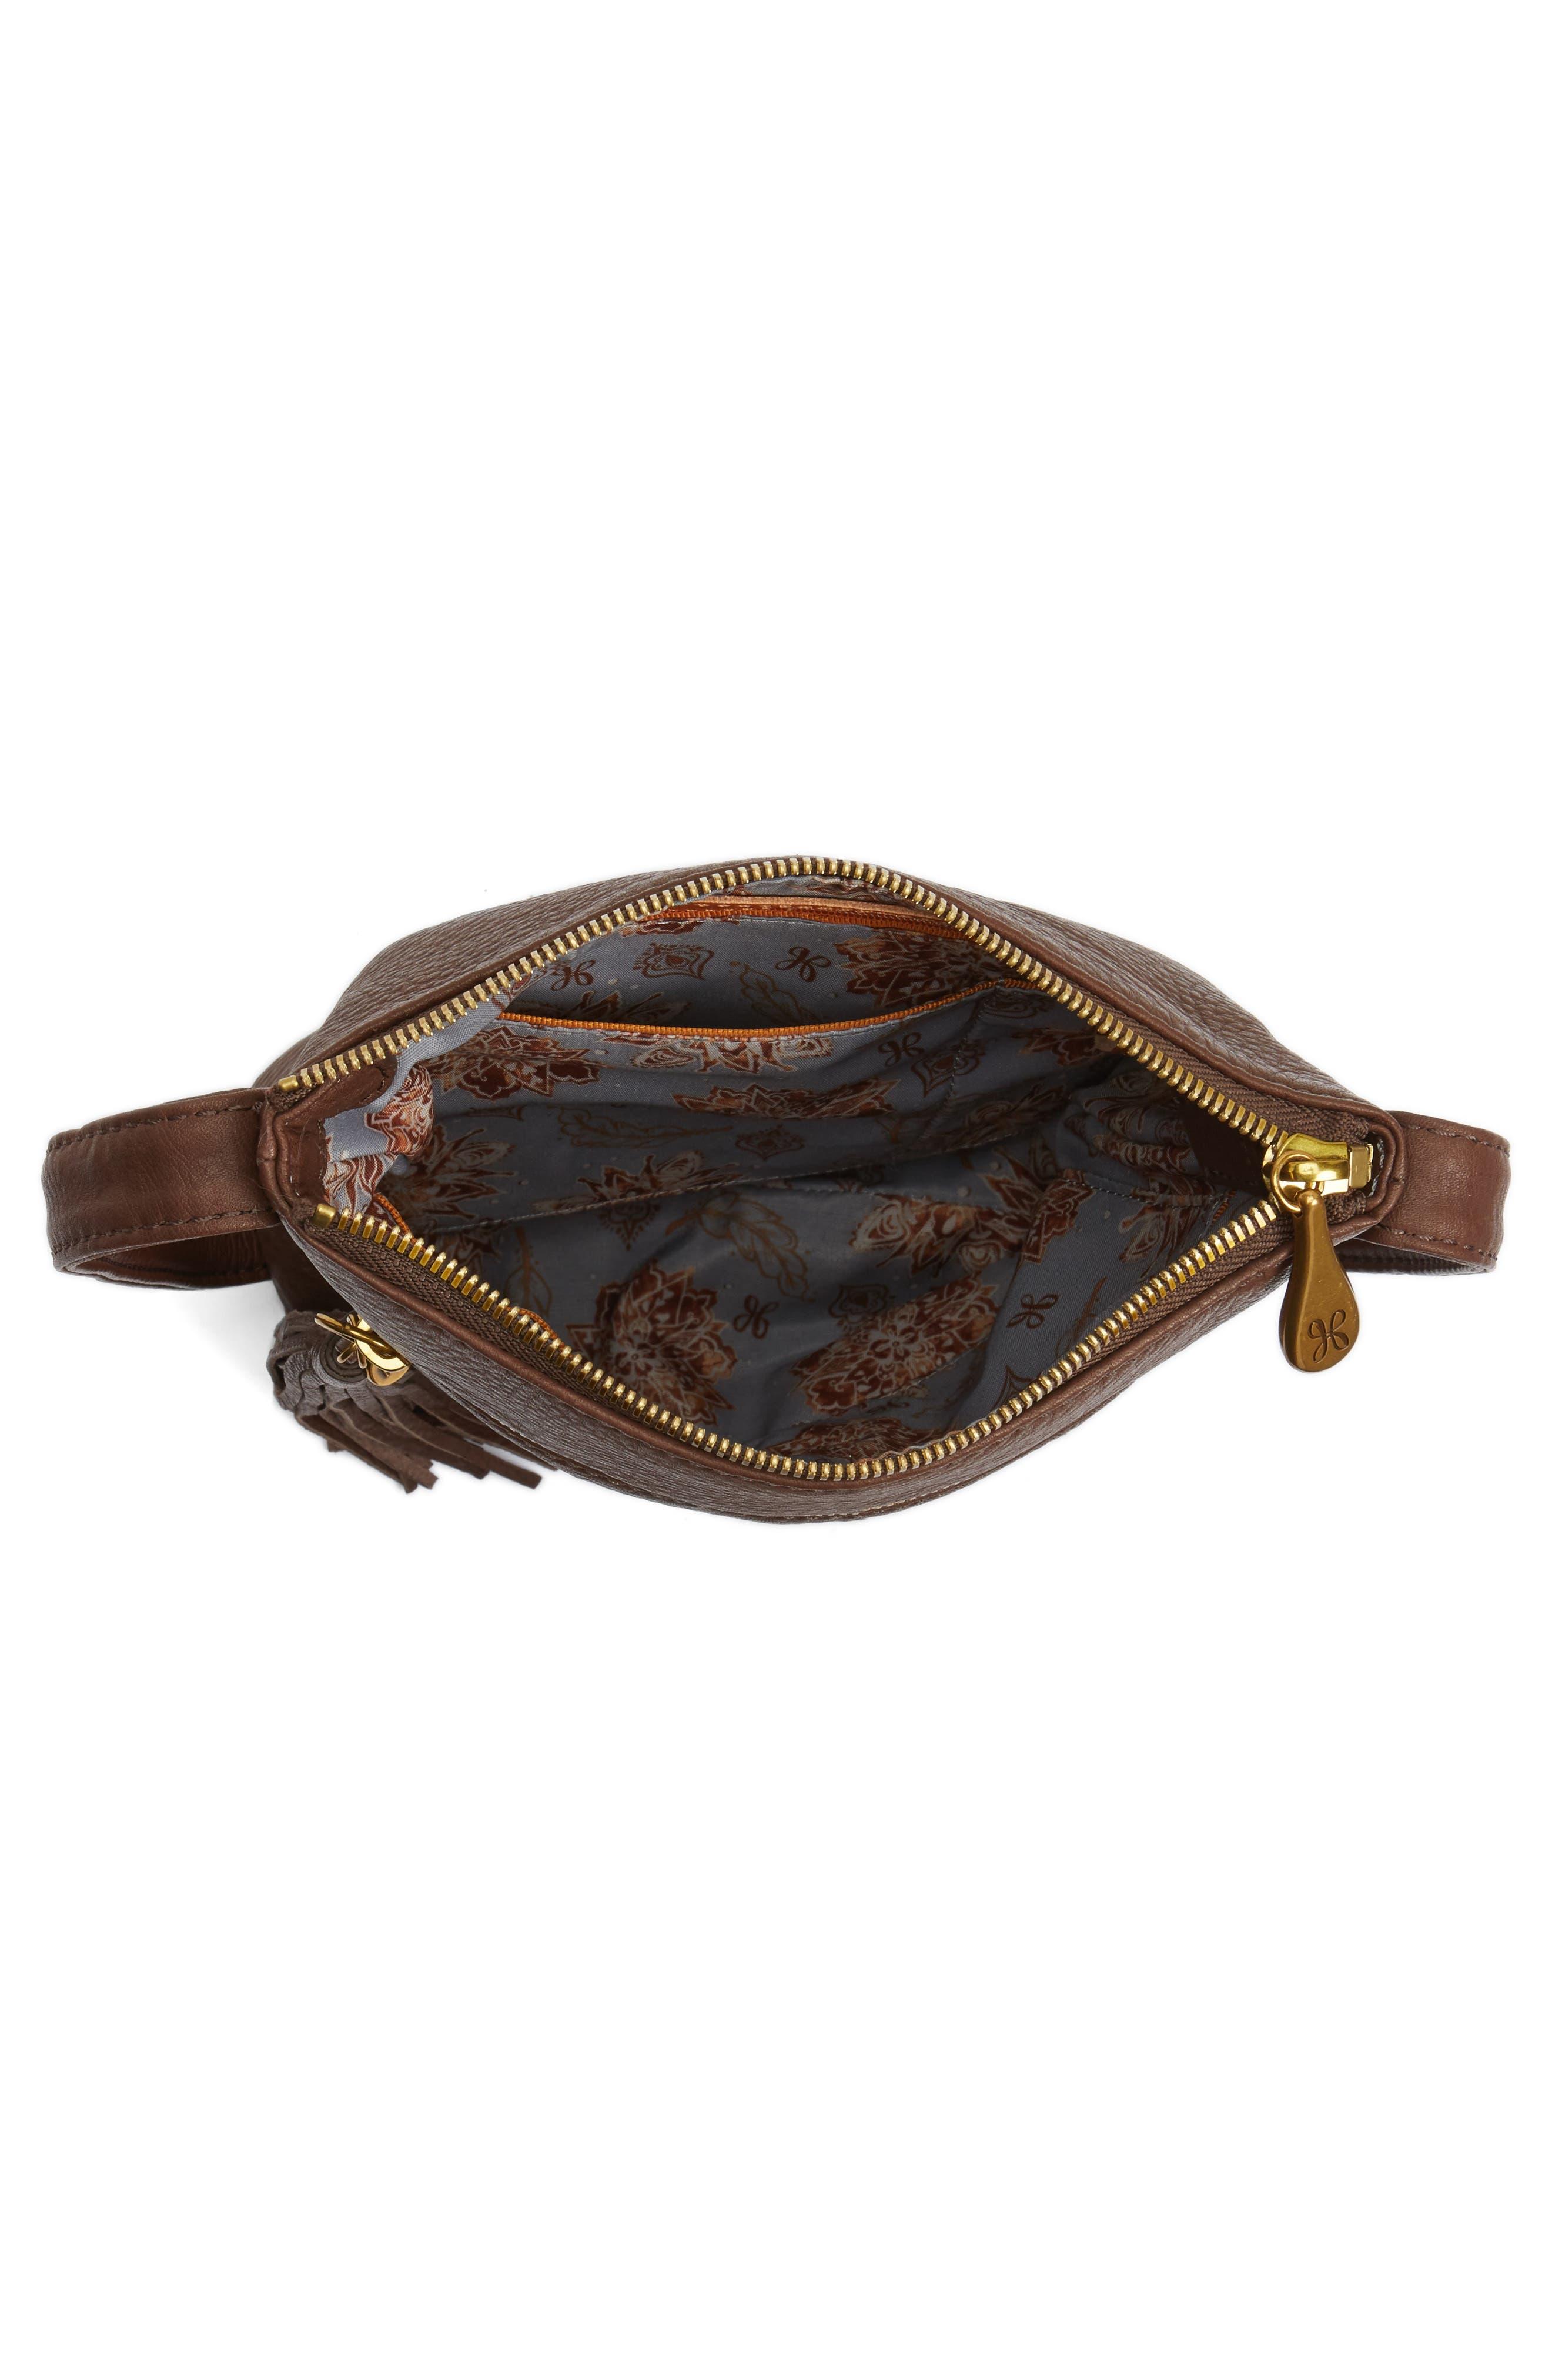 'Sarah' Leather Crossbody Bag,                             Alternate thumbnail 19, color,